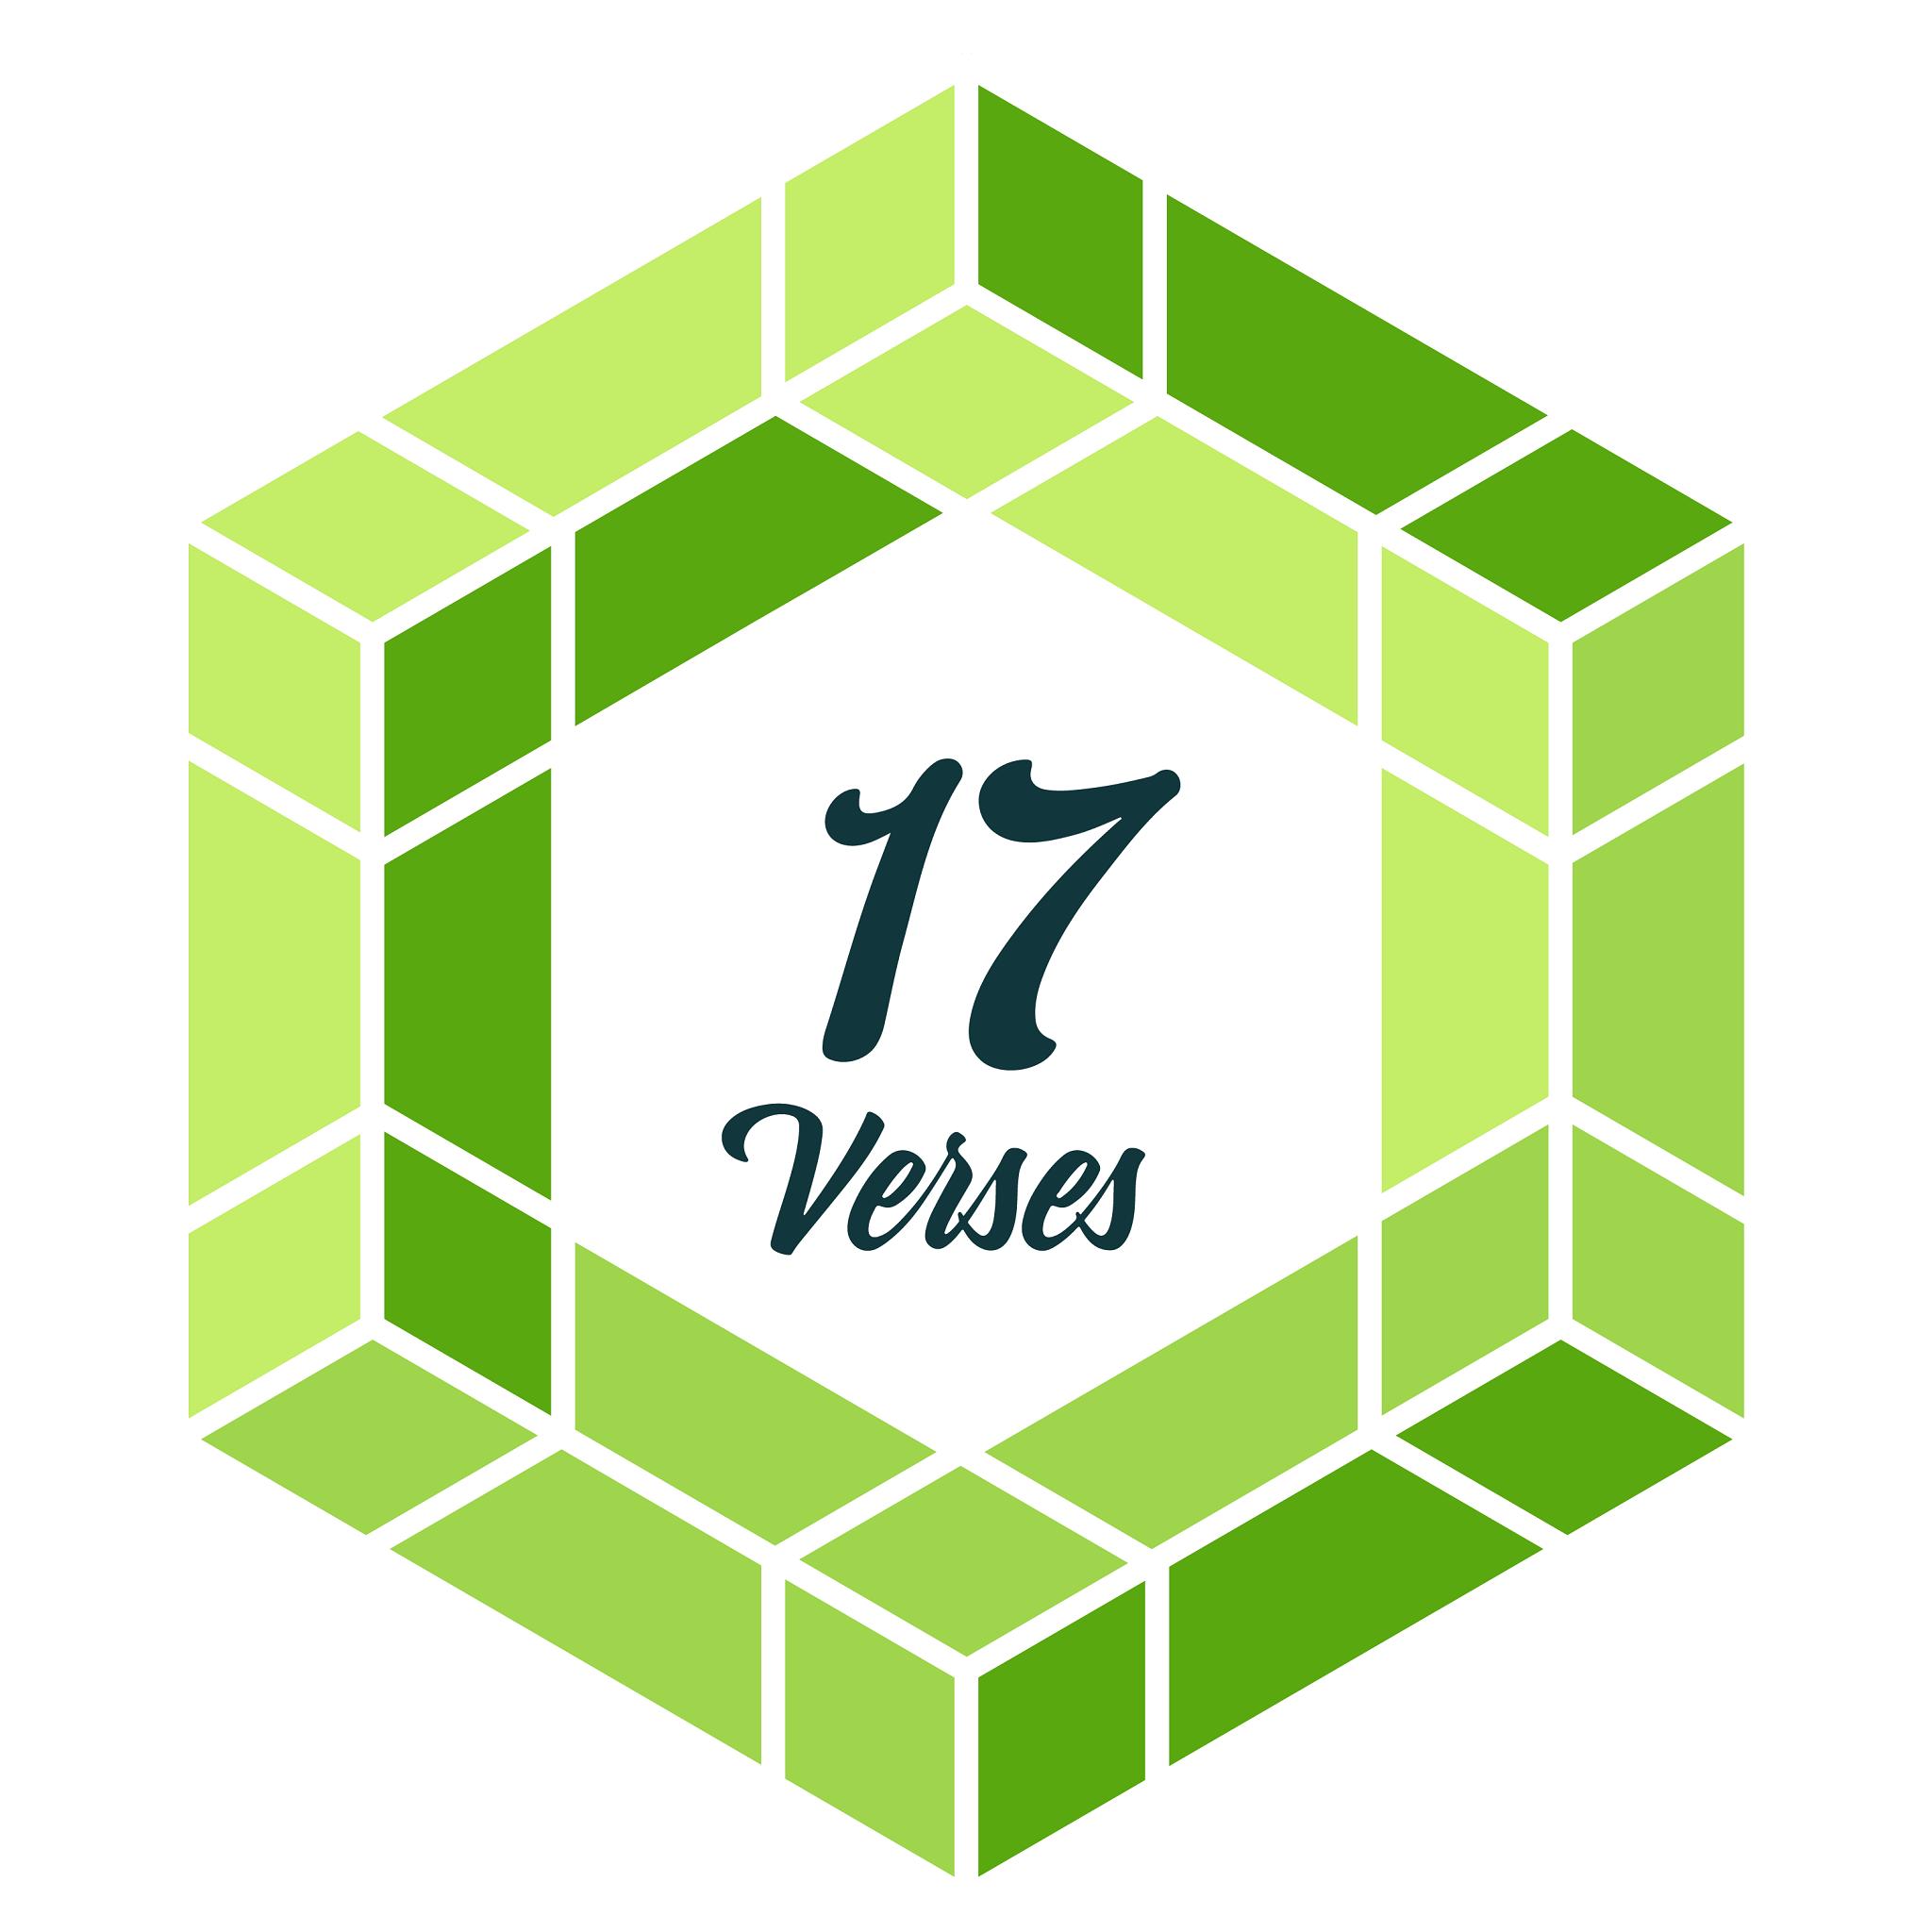 Year 2 - Surah 20 (Tâ-Hâ), Verses 77-89